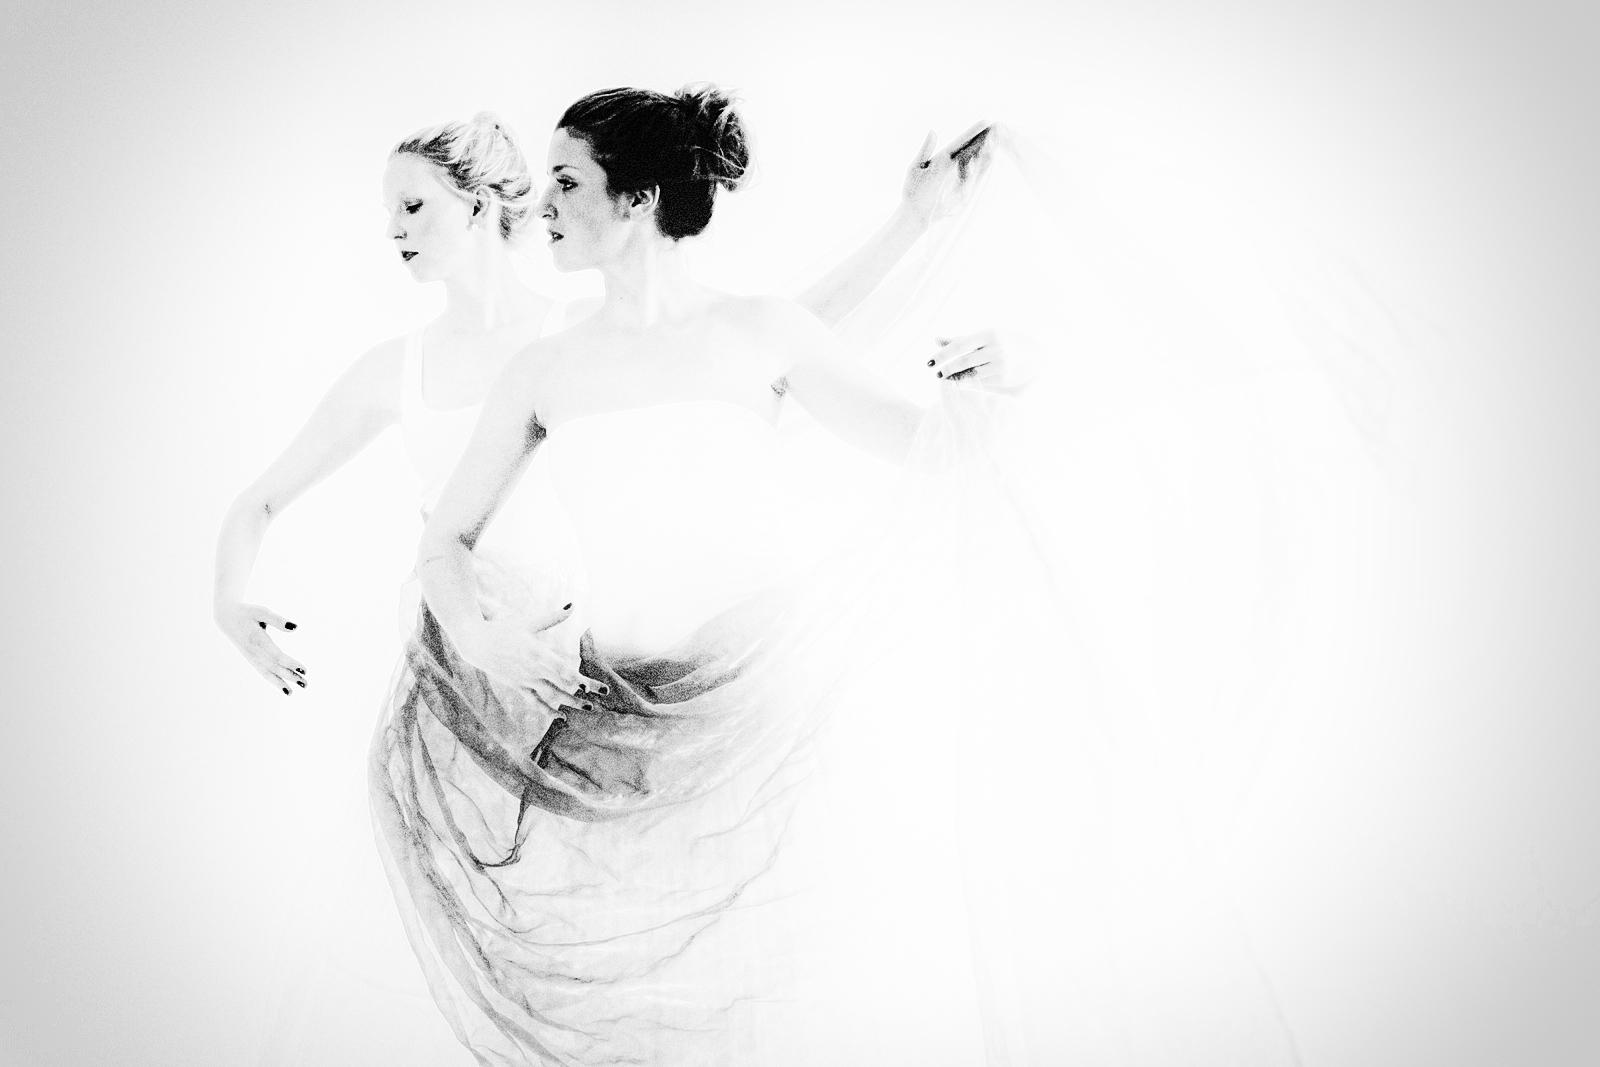 Tanz mit dem Wind 6